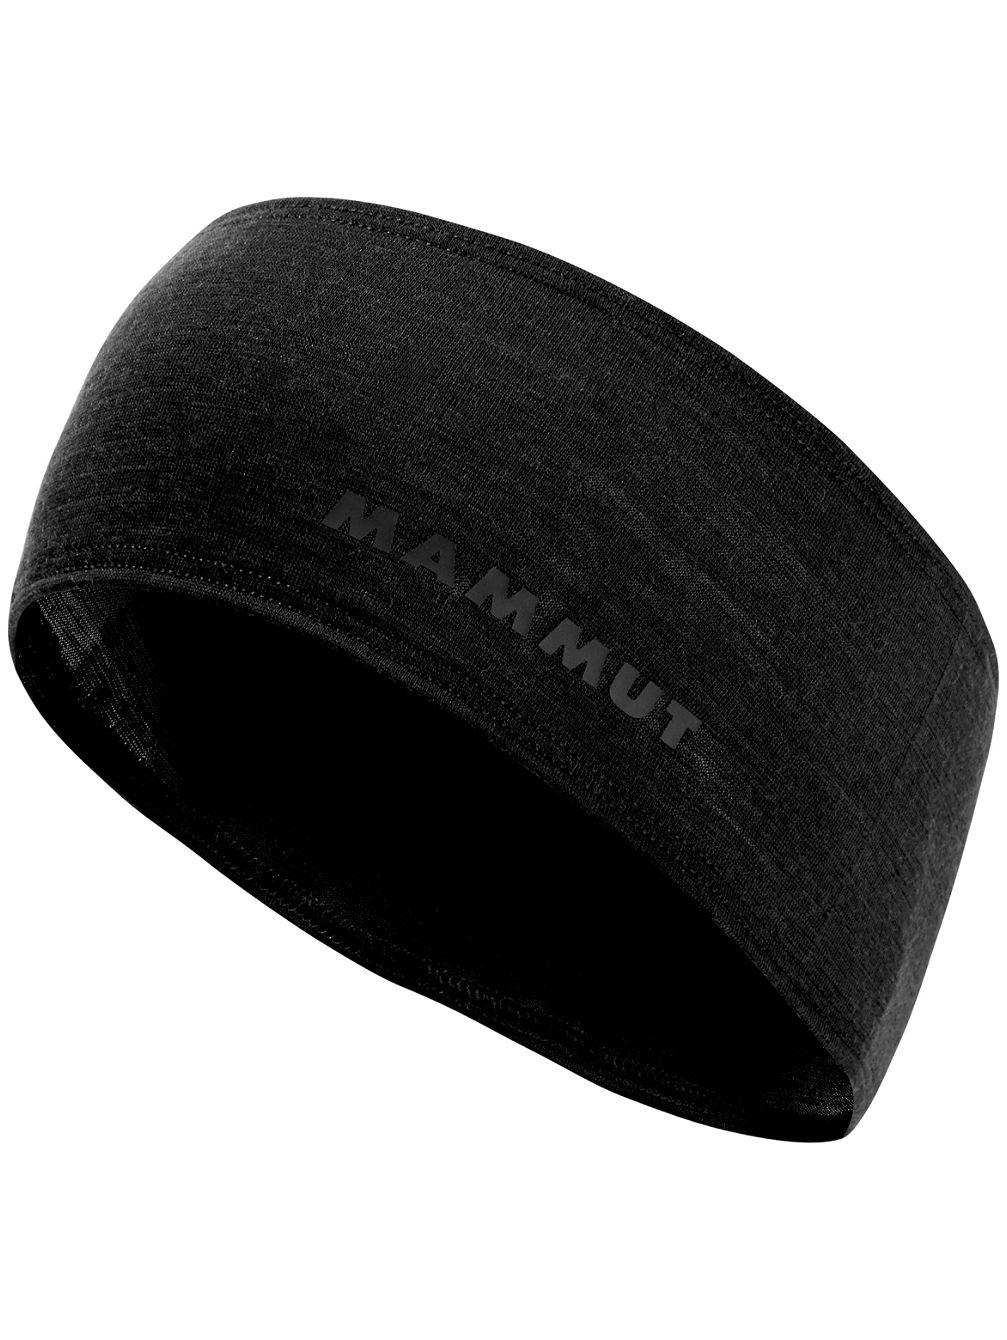 68ff8a5cbca Buy Mammut Merino Headband online at Blue Tomato